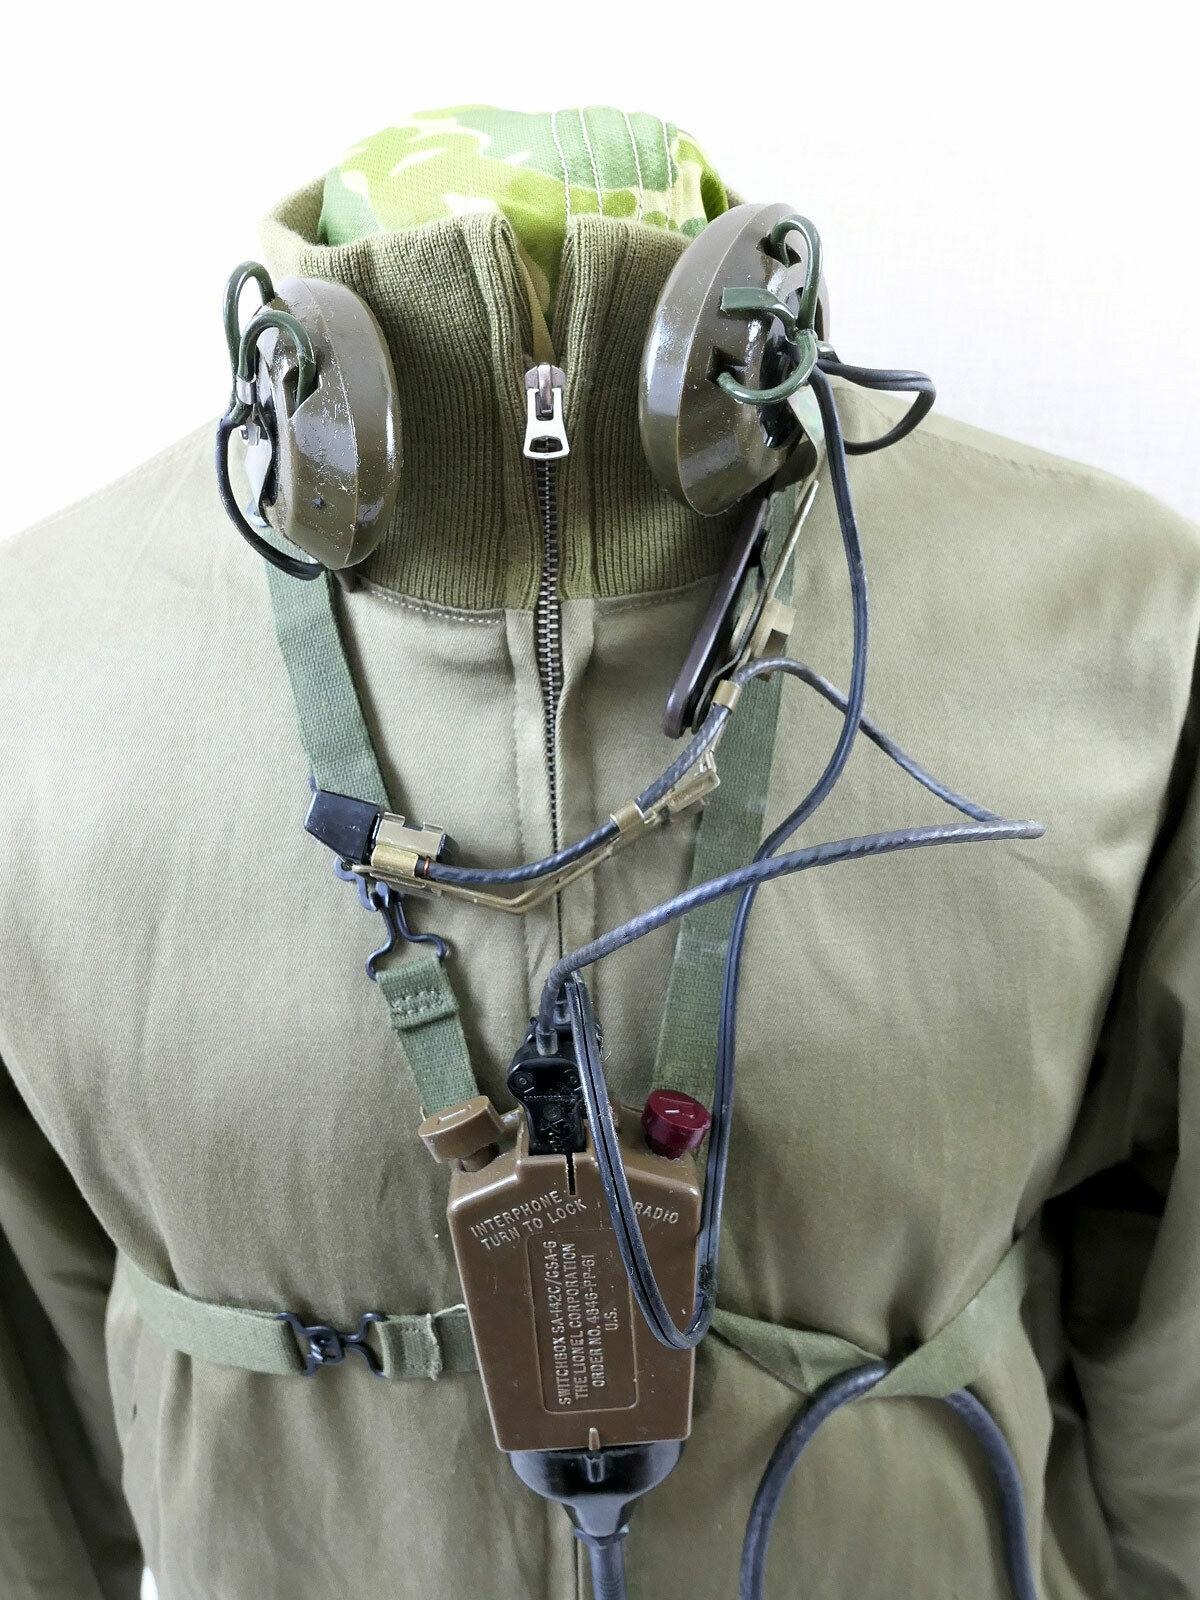 US ARMY Vietnam chest set AN//GSA-6 Radio mit Kopfhörer Microphone Funk Mikrofon